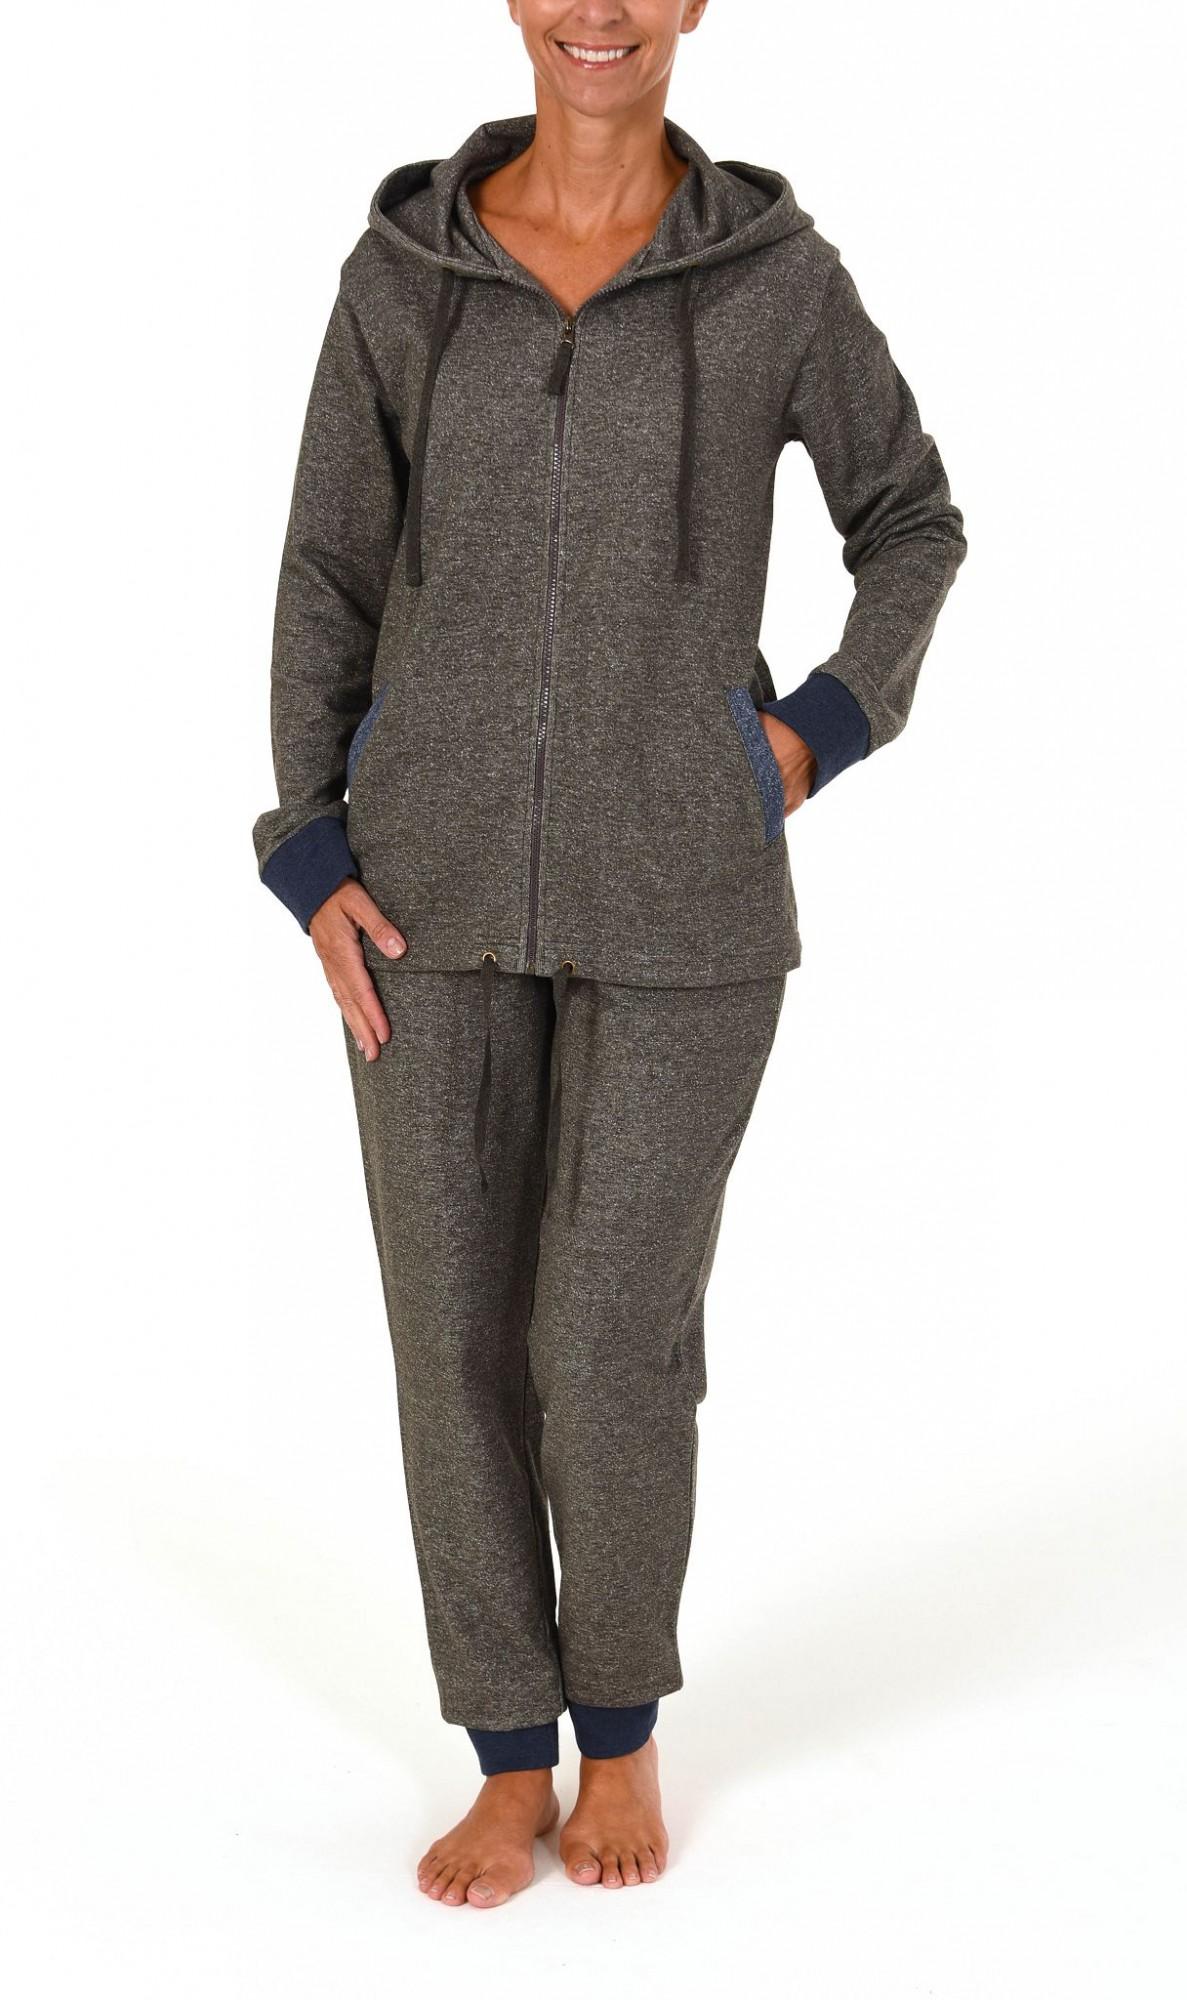 Damen Loungewear Hausanzug aus French Terry – 261 216 99 444 – Bild 2